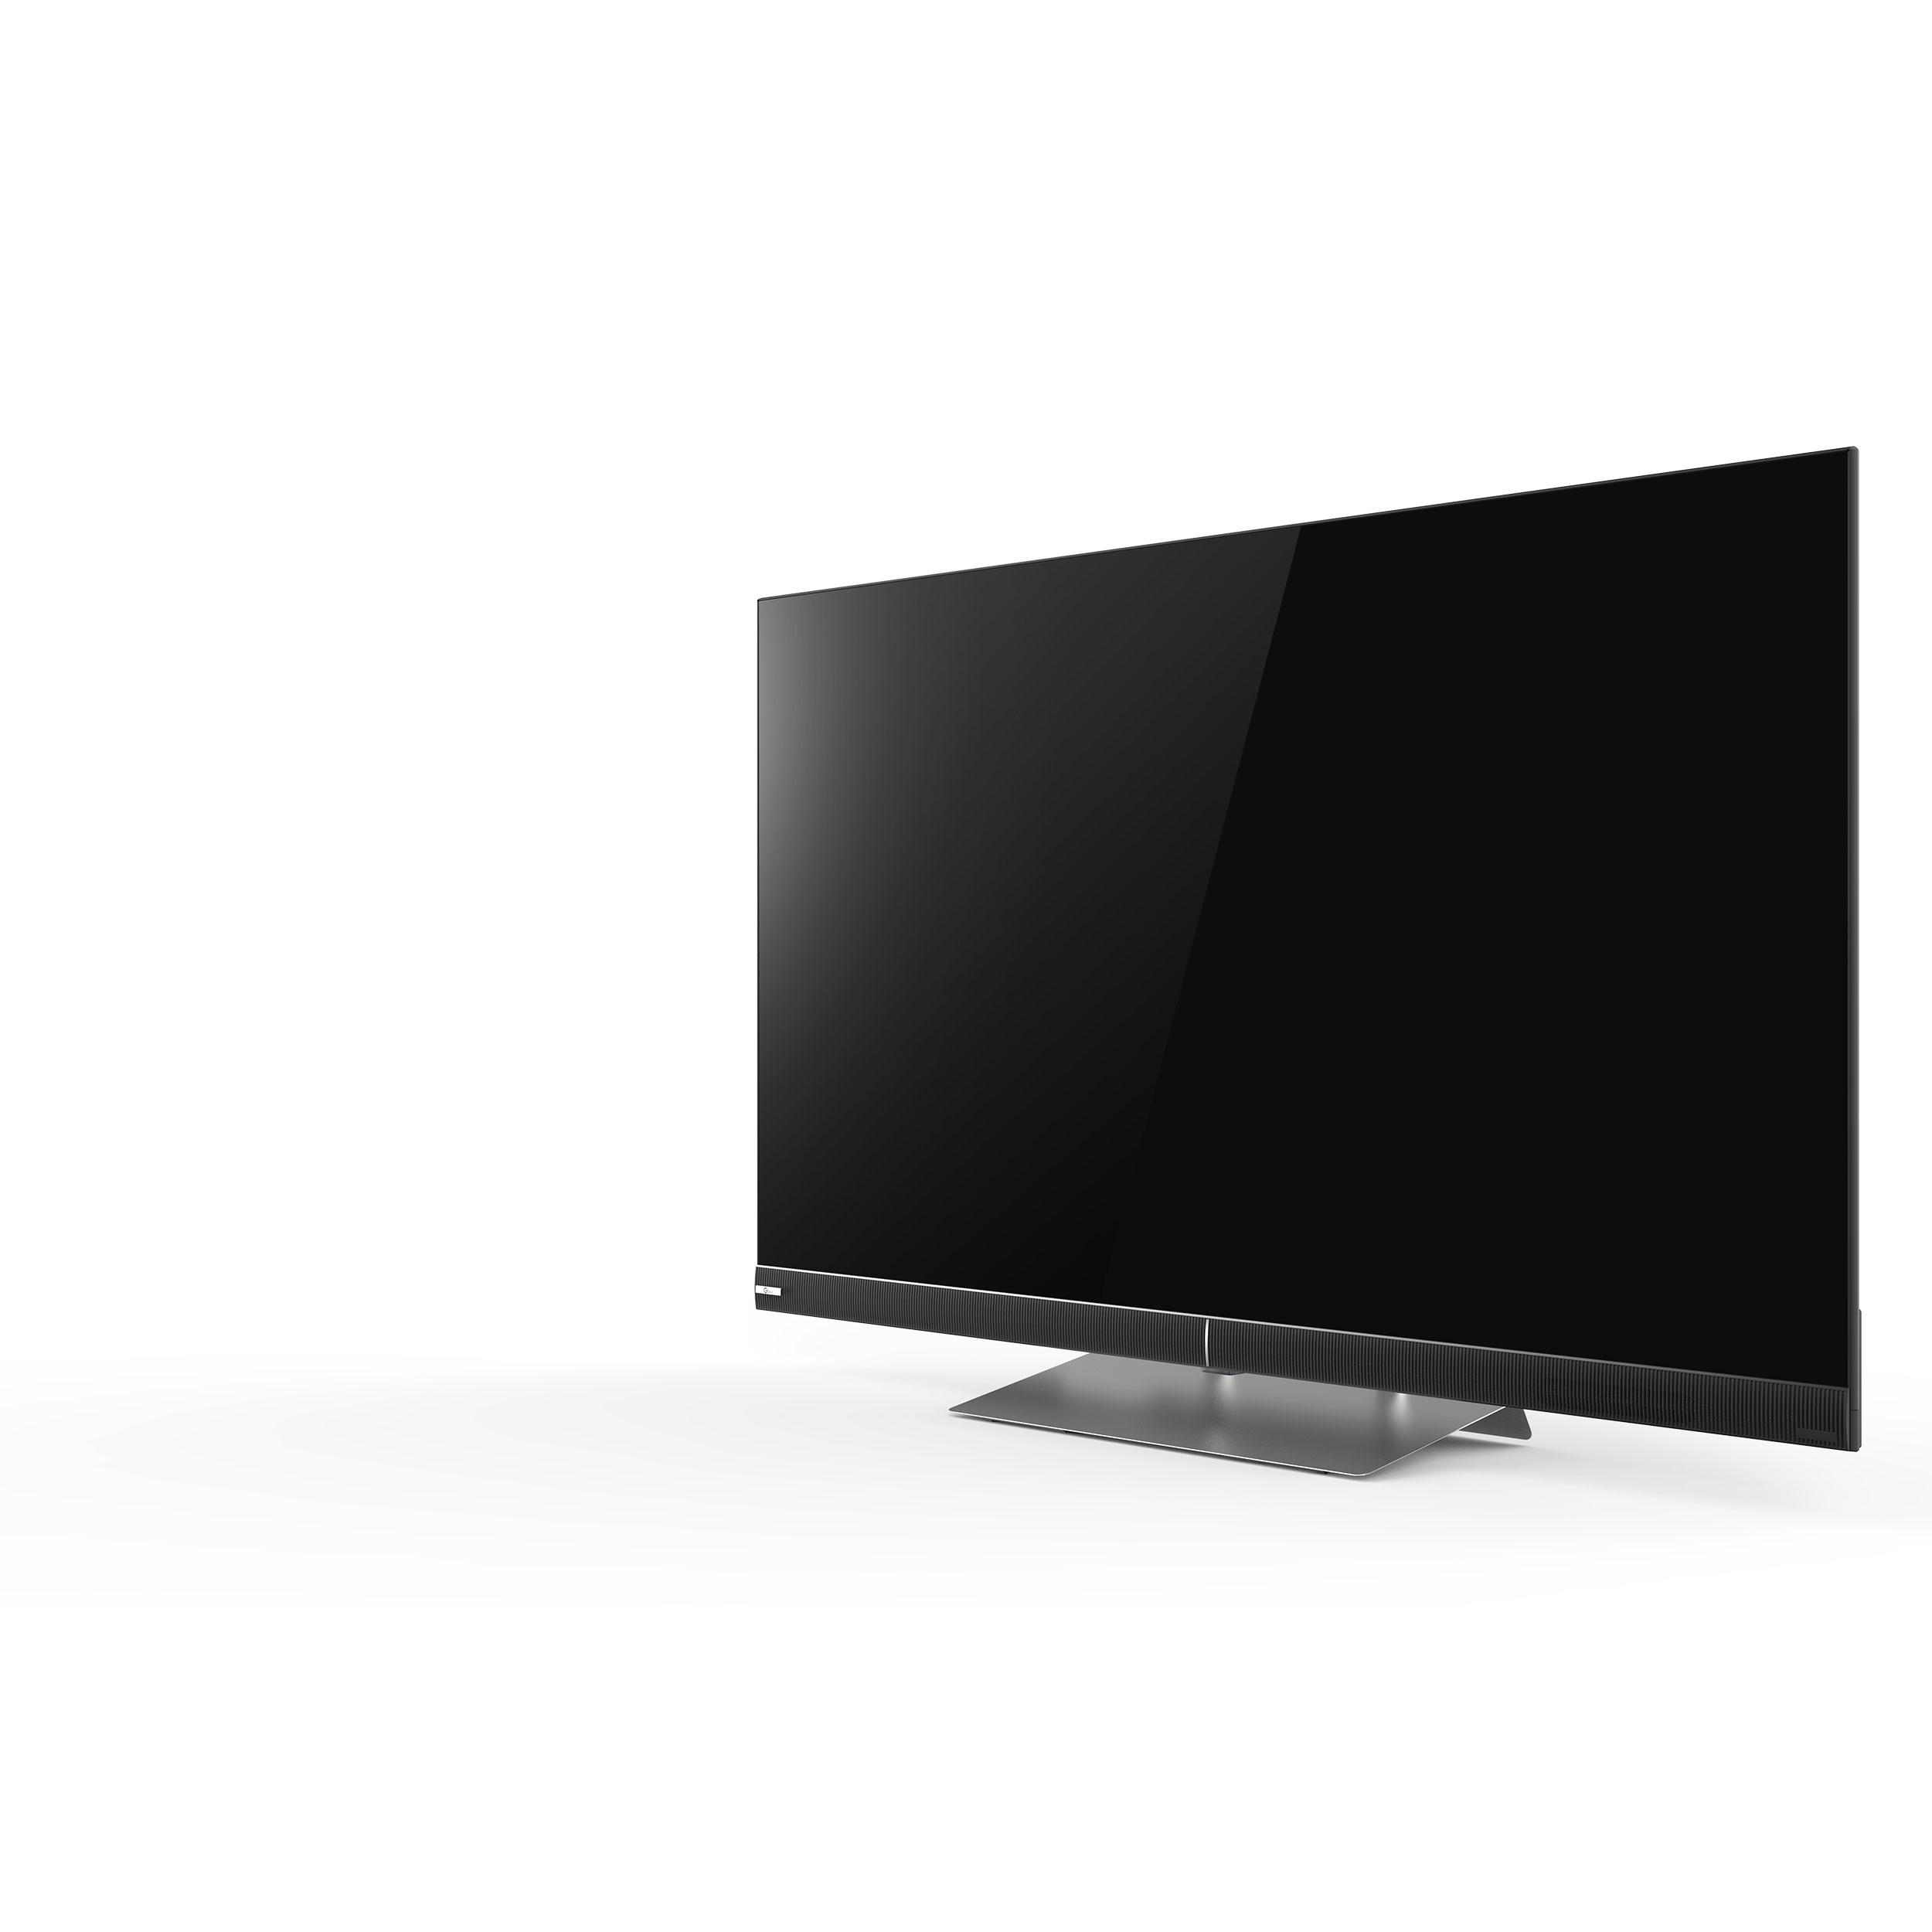 تلویزیون ال ای دی هوشمند جی پلاس مدل GTV-55LQ721S سایز 55 اینچ main 1 3